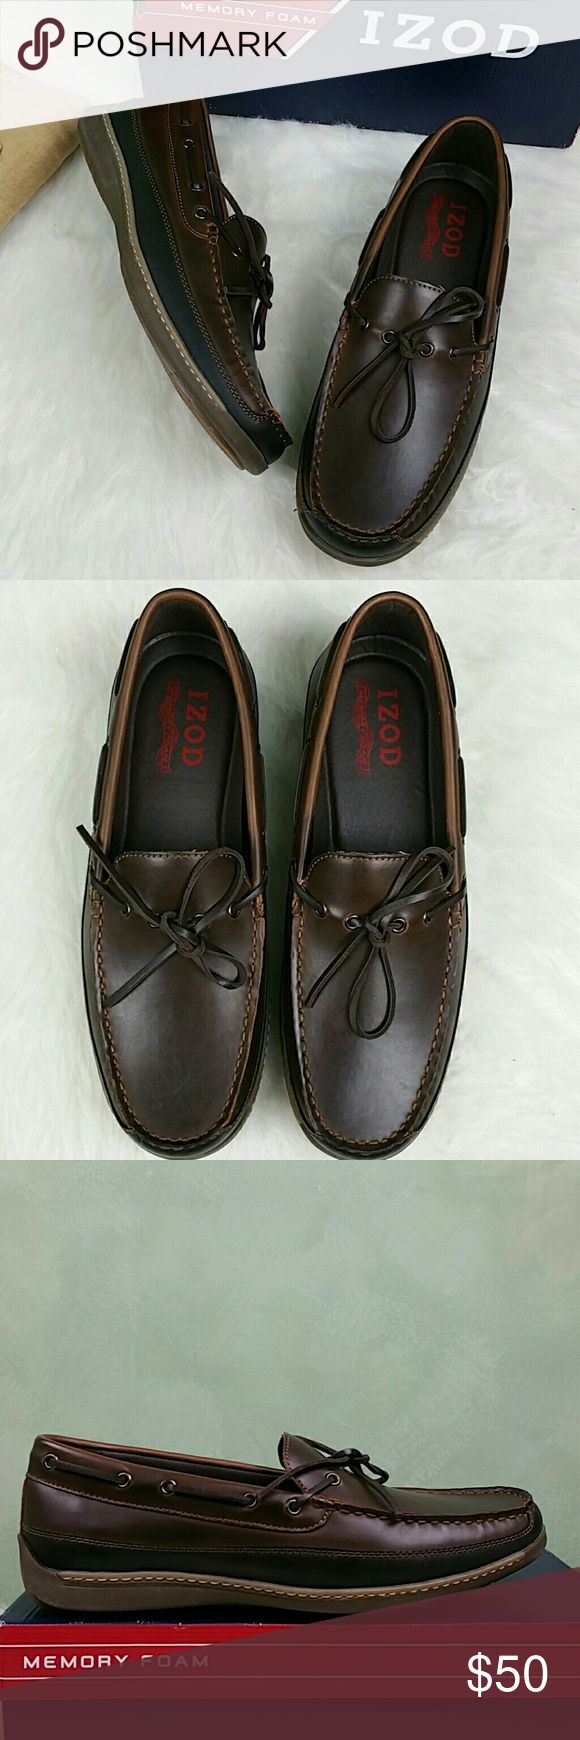 Izod Men's Heller Boat Shoe, Brown, Size 11M Izod Men's Heller Boat Shoe New with box  Size: Men's U.S. 11 M, EUR 44 -45 Color: Brown   Material: Synthetic Rubber sole Memory foam innersole Flexible Sole Izod Shoes Loafers & Slip-Ons